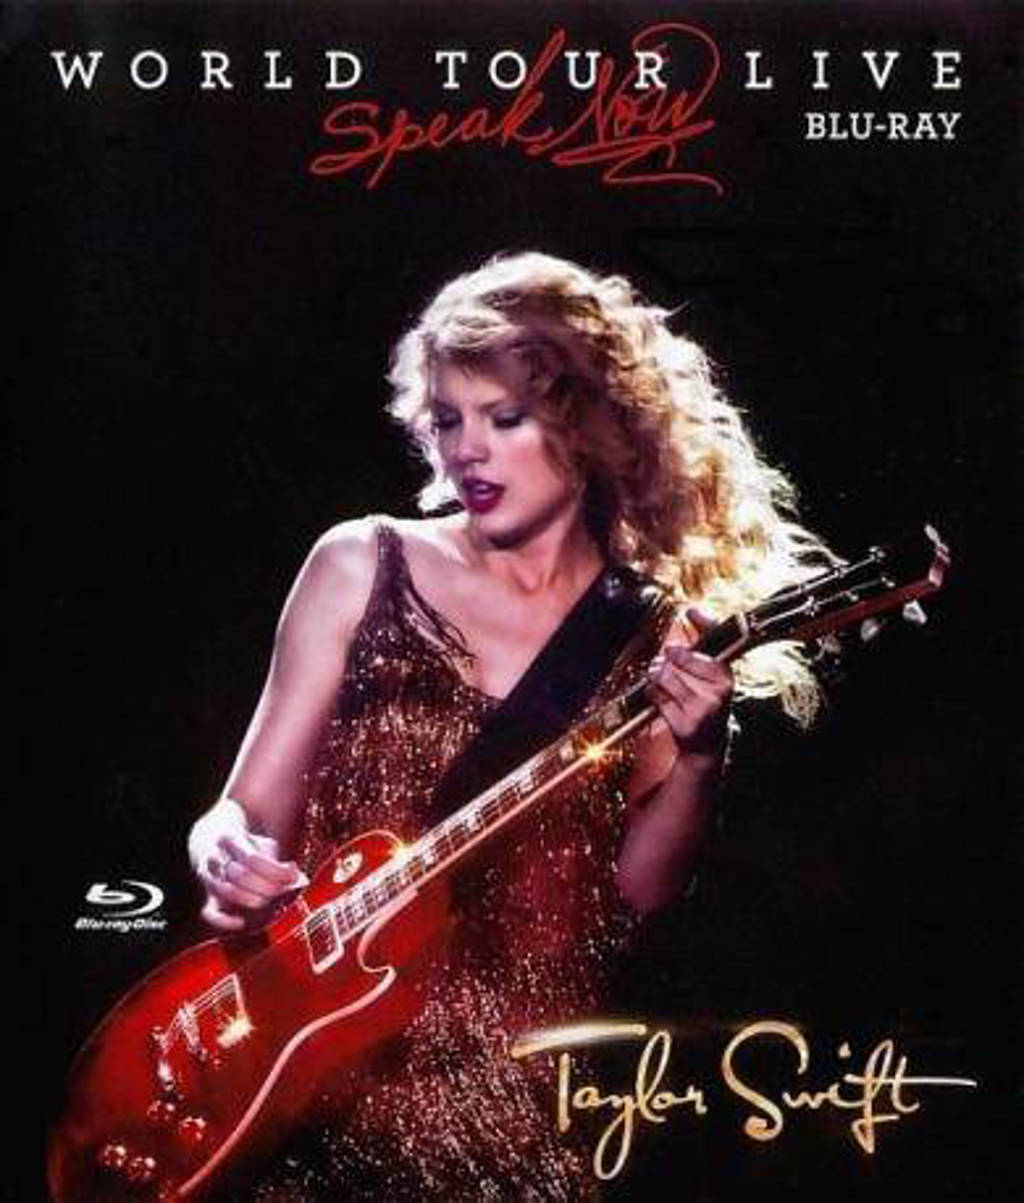 Taylor Swift - Speak Now World Tour Live (Blu-ray)